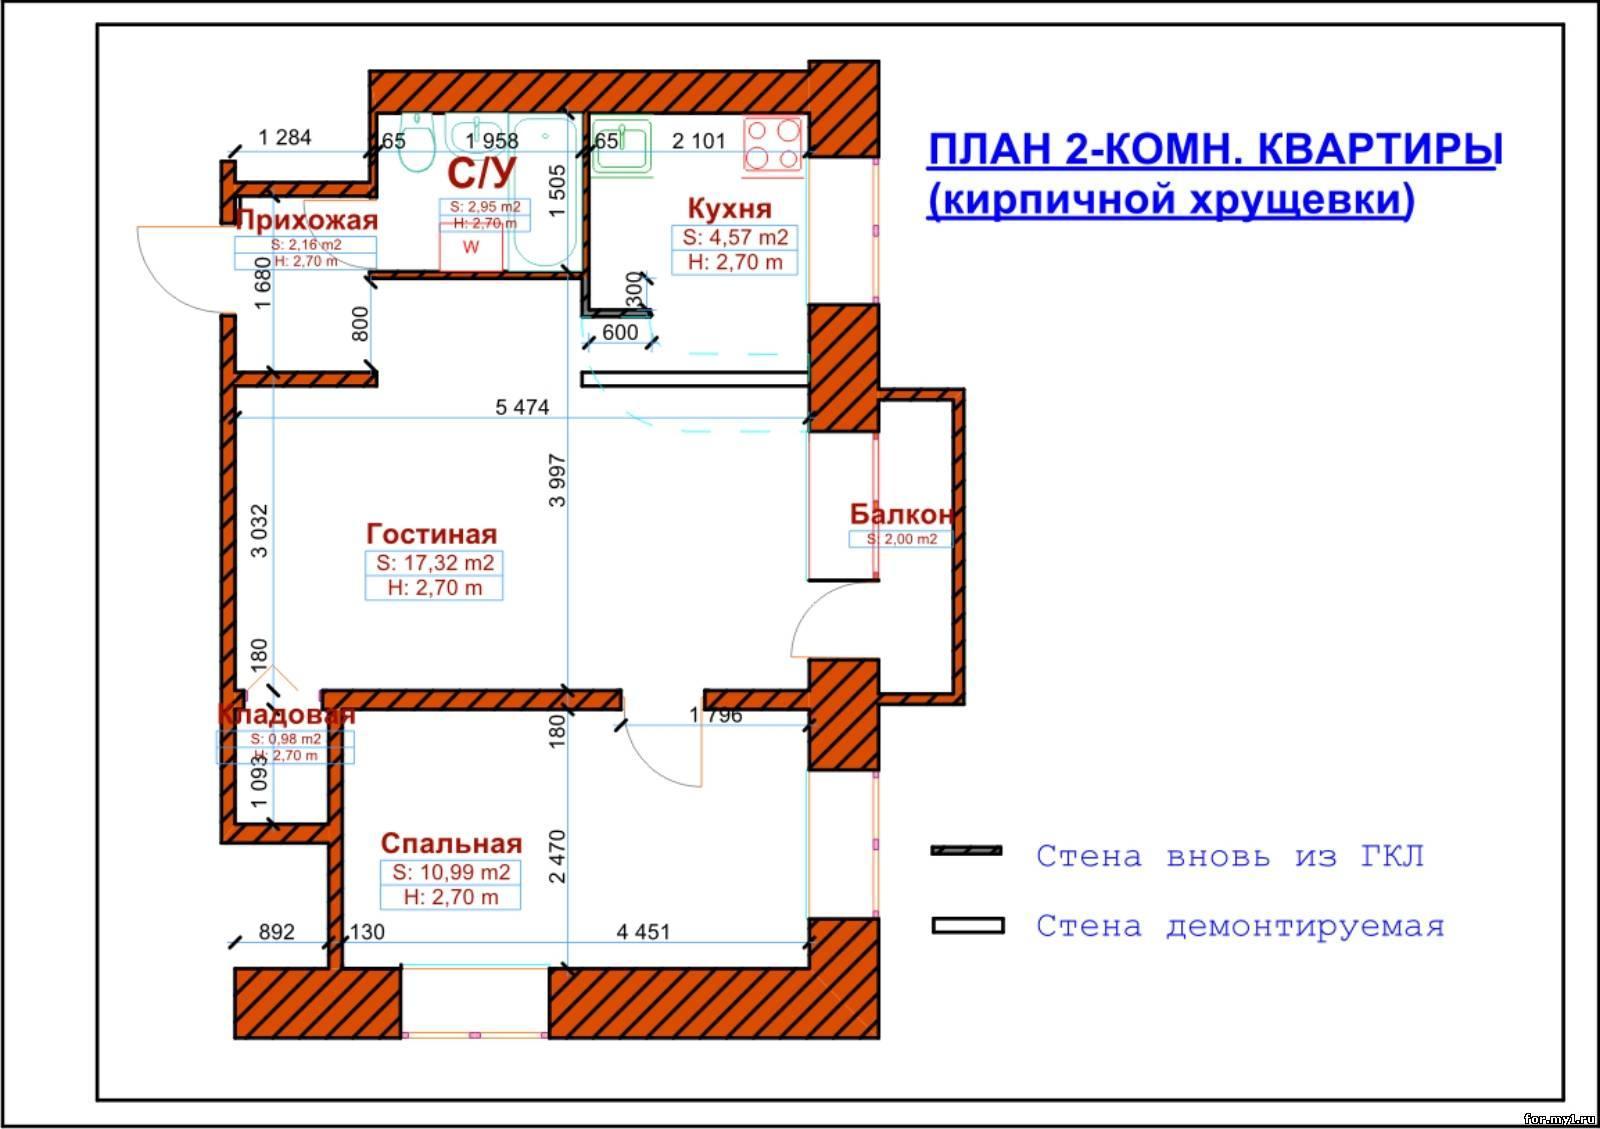 Планировка и дизайн кухни хрущевка